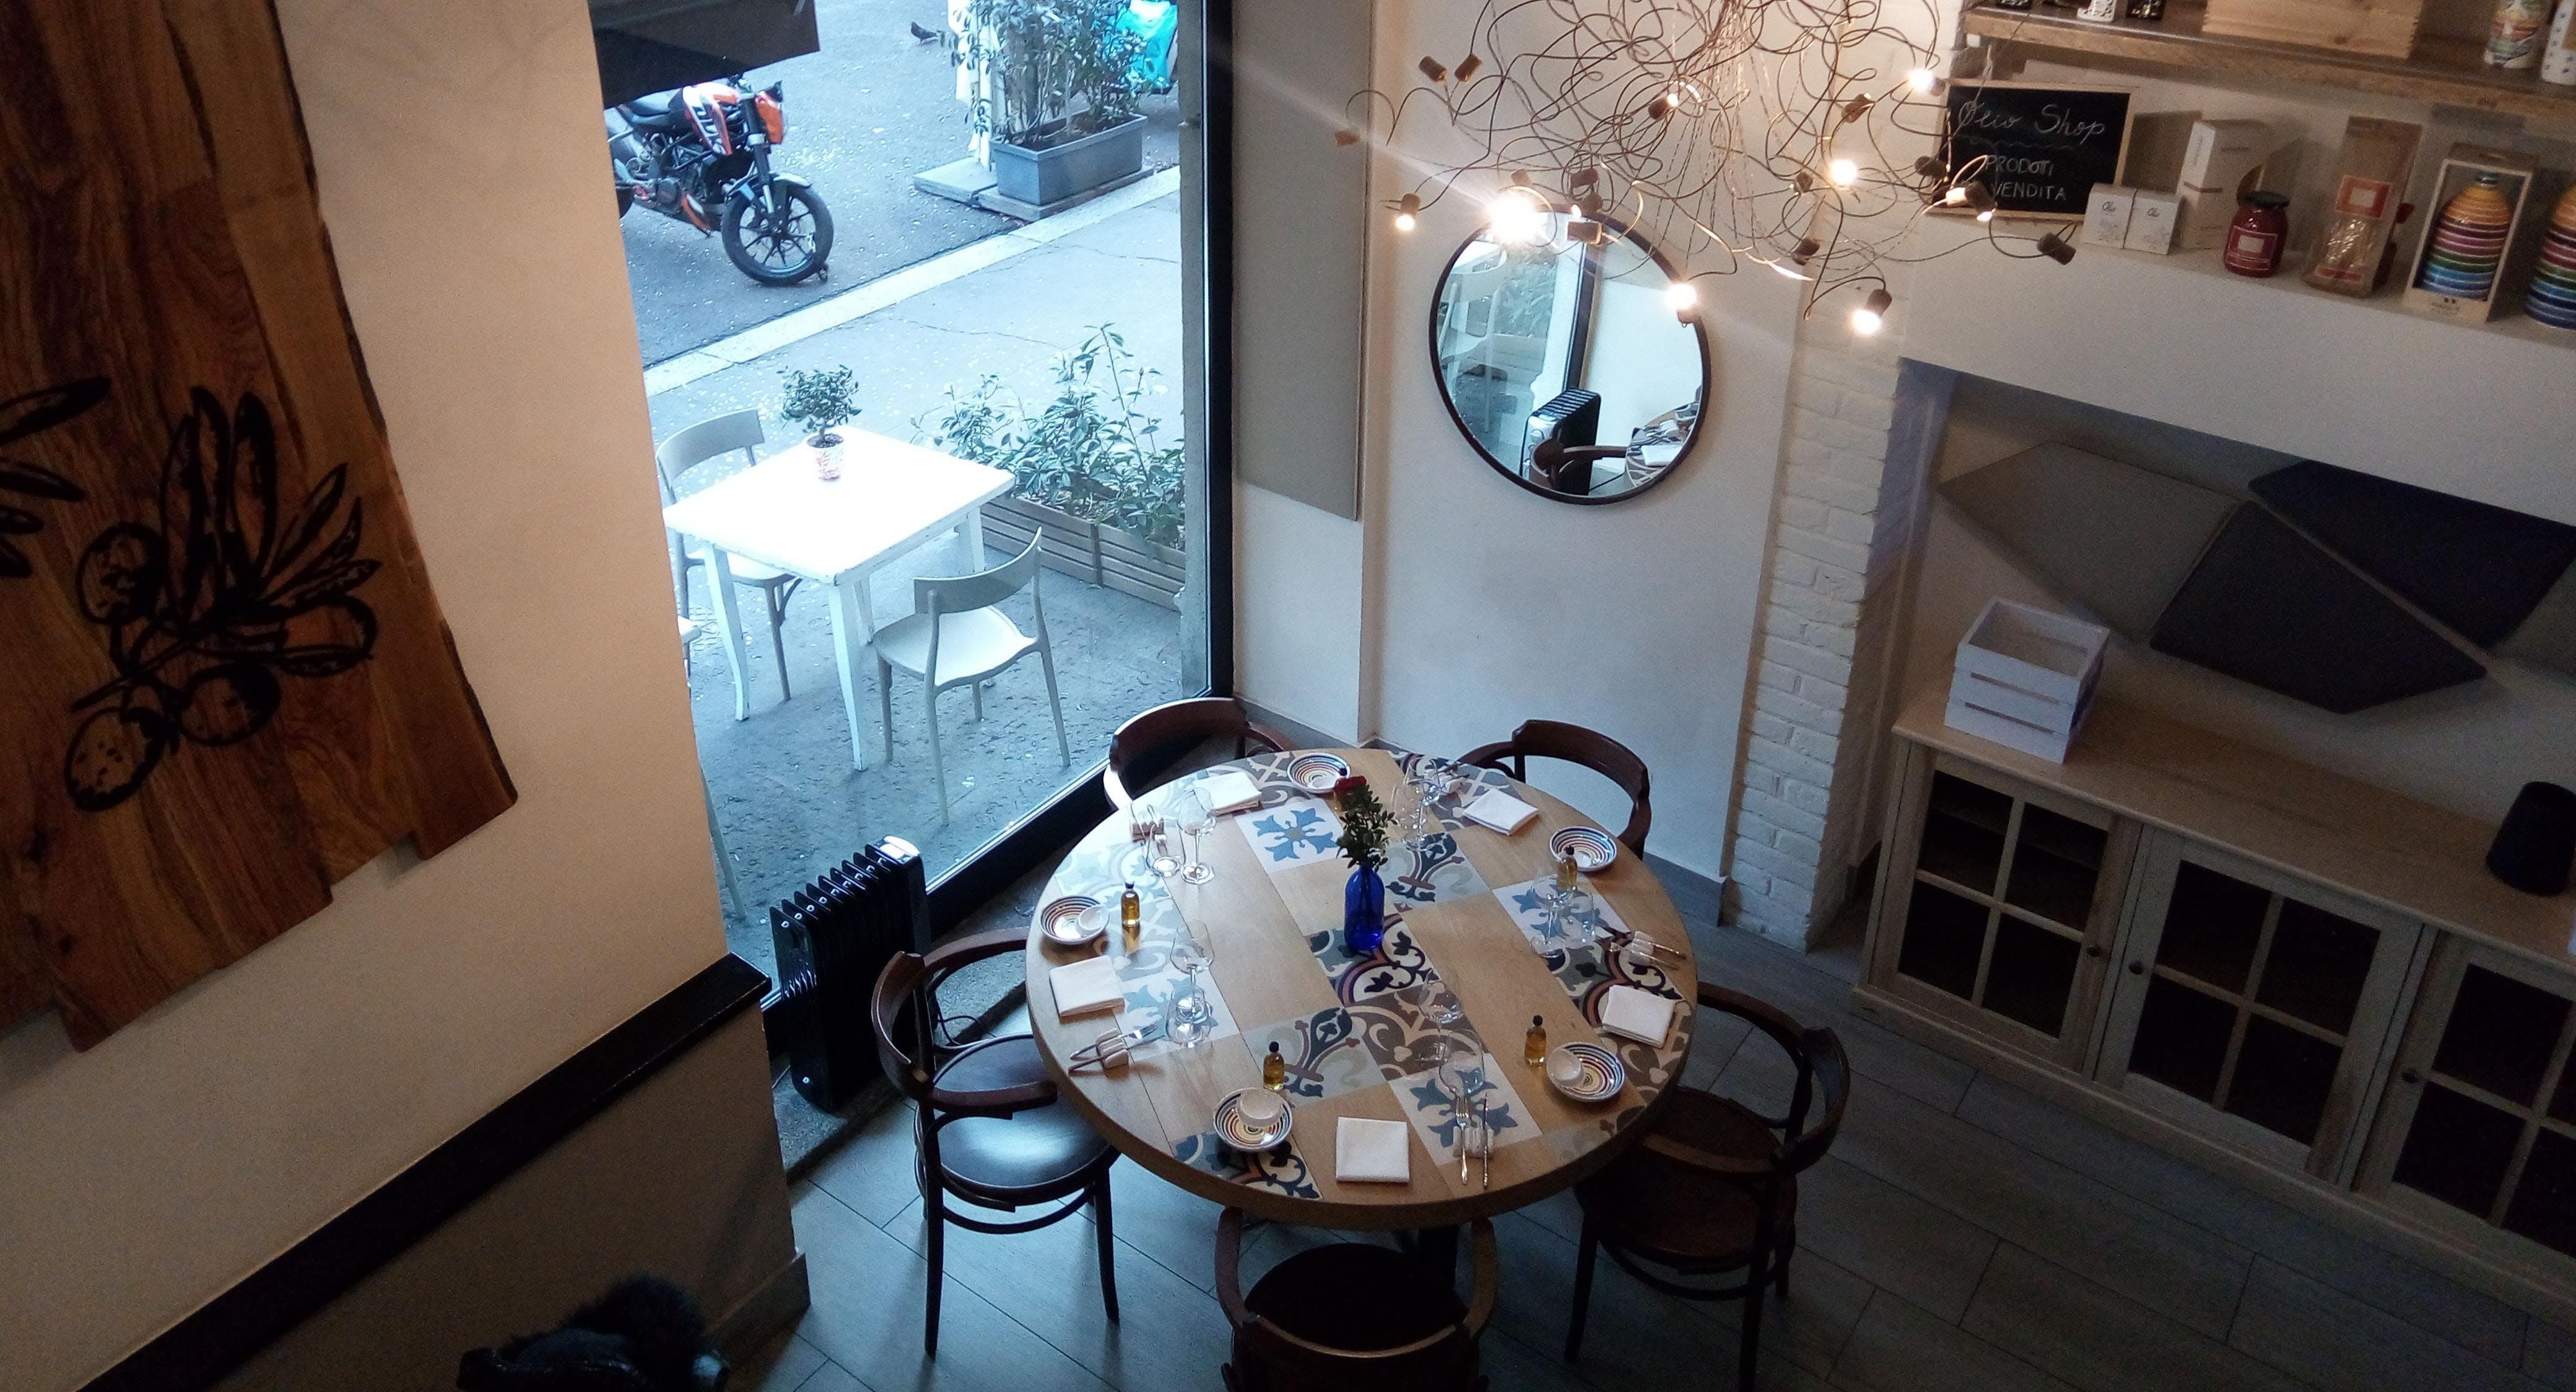 Olio - Cucina Fresca Milan image 2